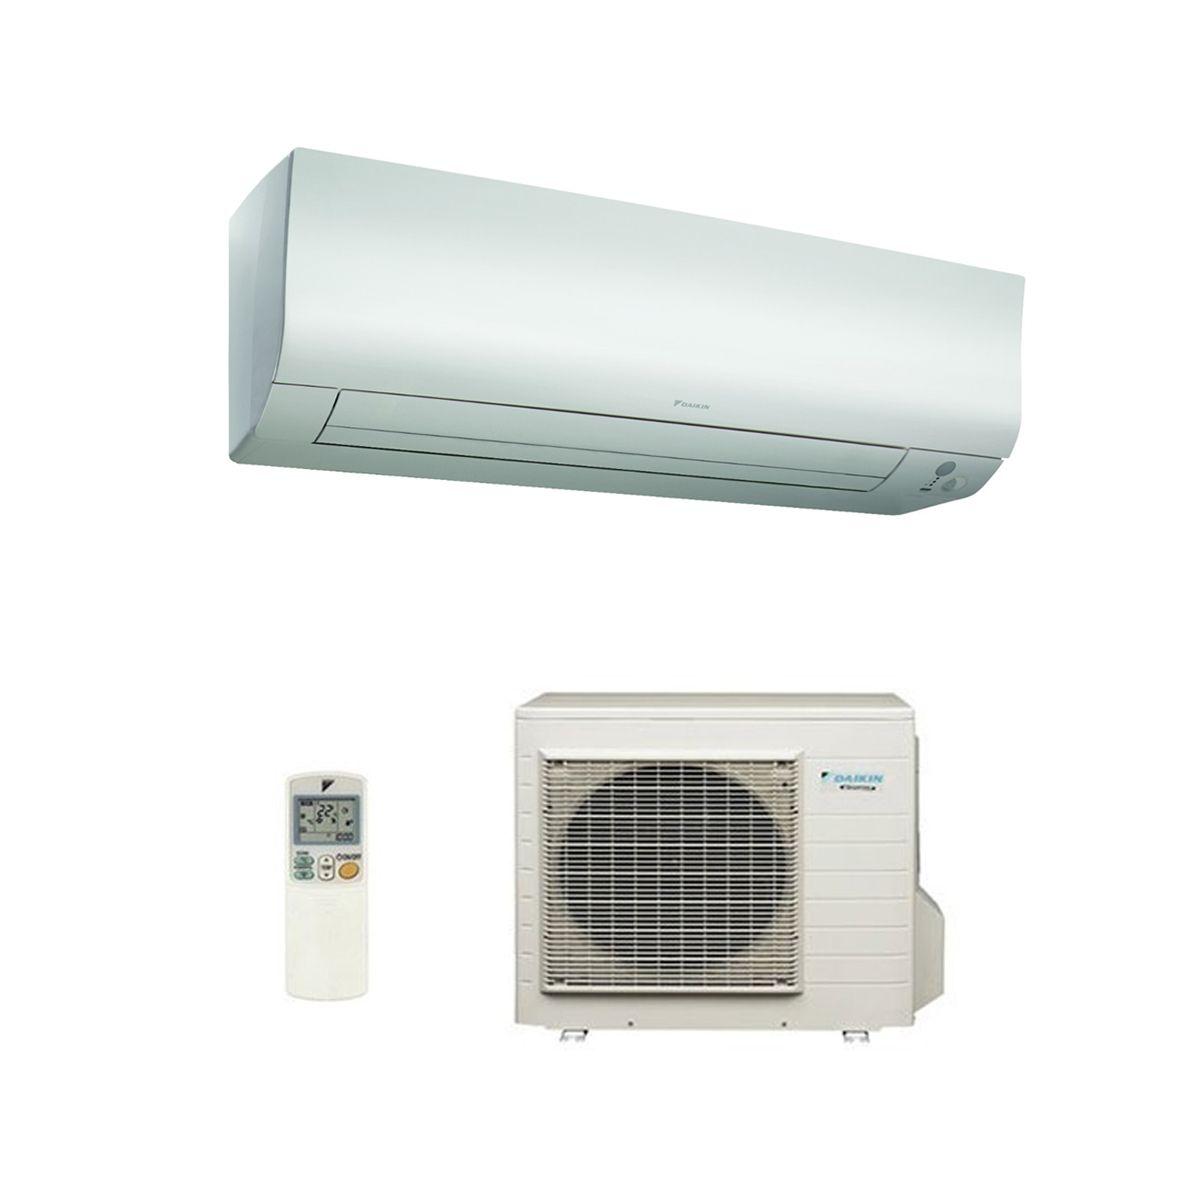 Daikin Air Conditioning Ftxm60m Wall Mounted 6kw 19000btu